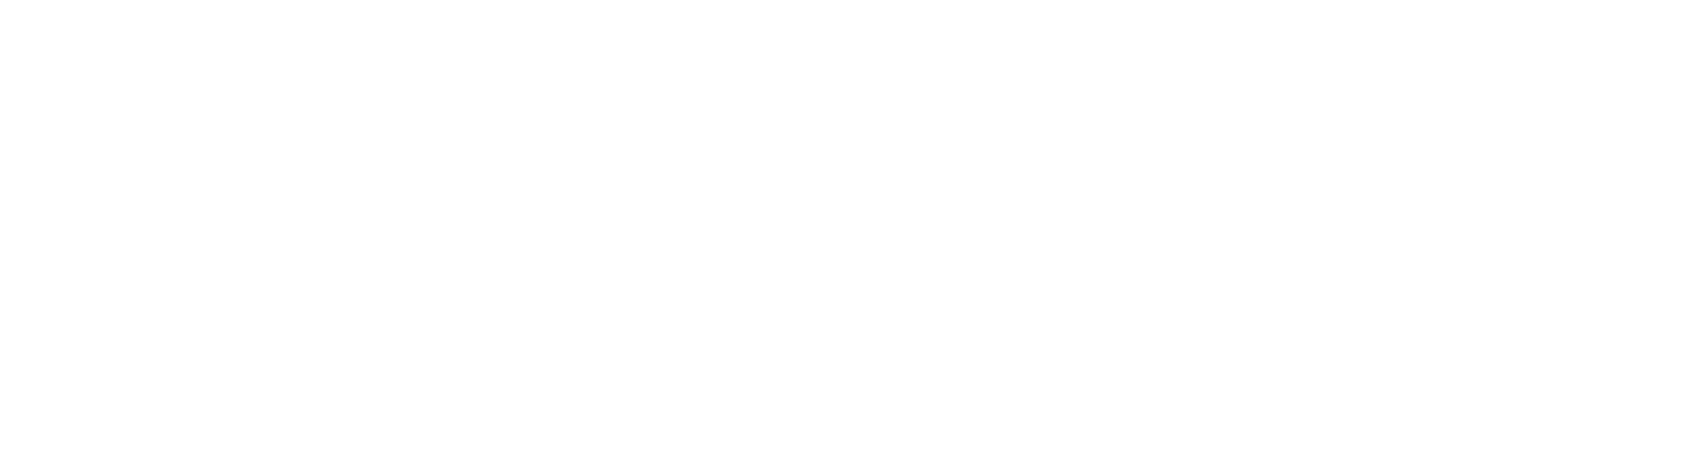 http---a.amz.mshcdn.com-wp-content-uploads-2016-03-pp_h_1C_white11.png